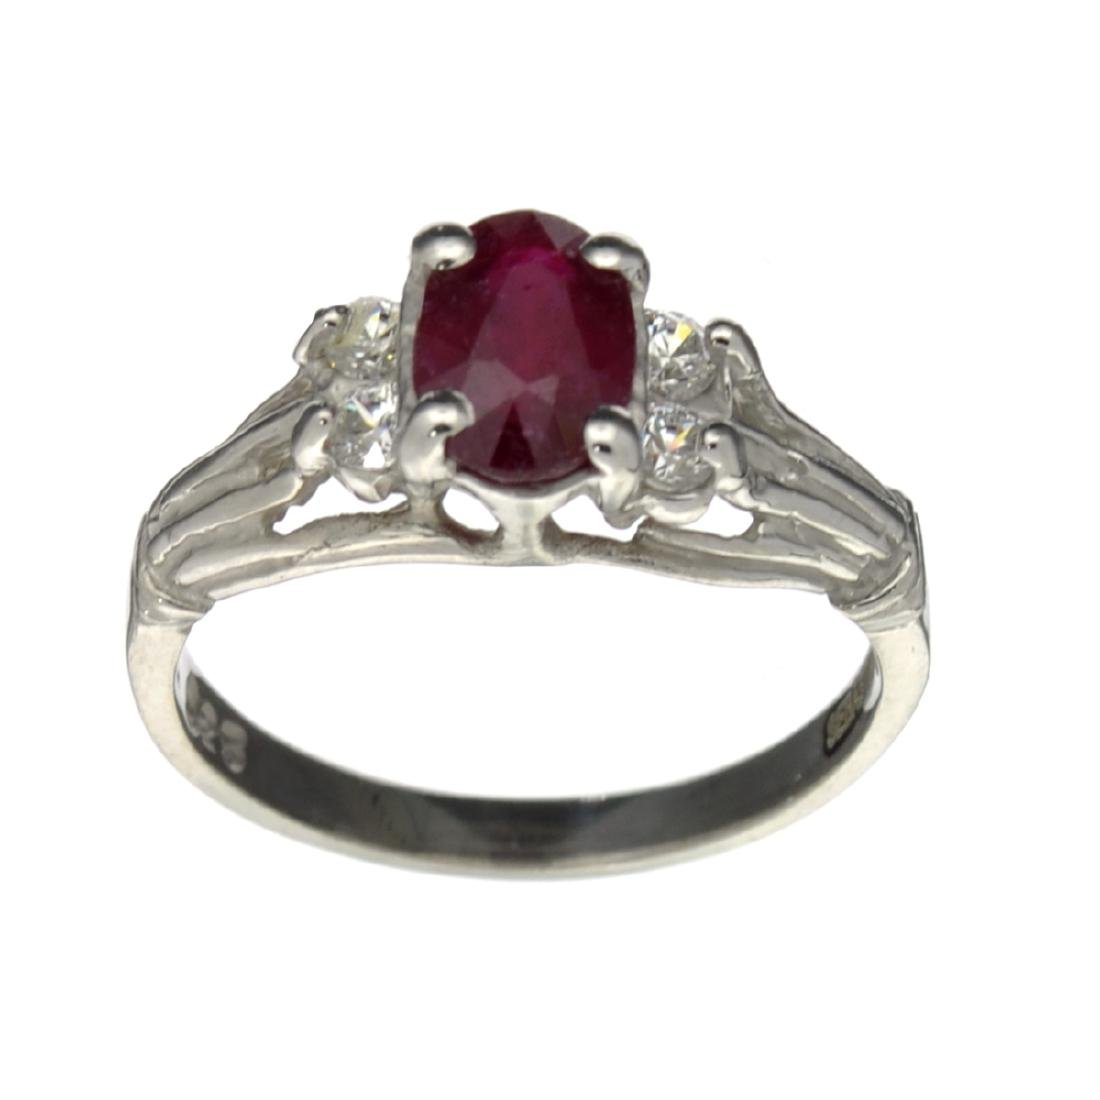 APP: 0.5k Fine Jewelry Designer Sebastian, 1.27CT Ruby